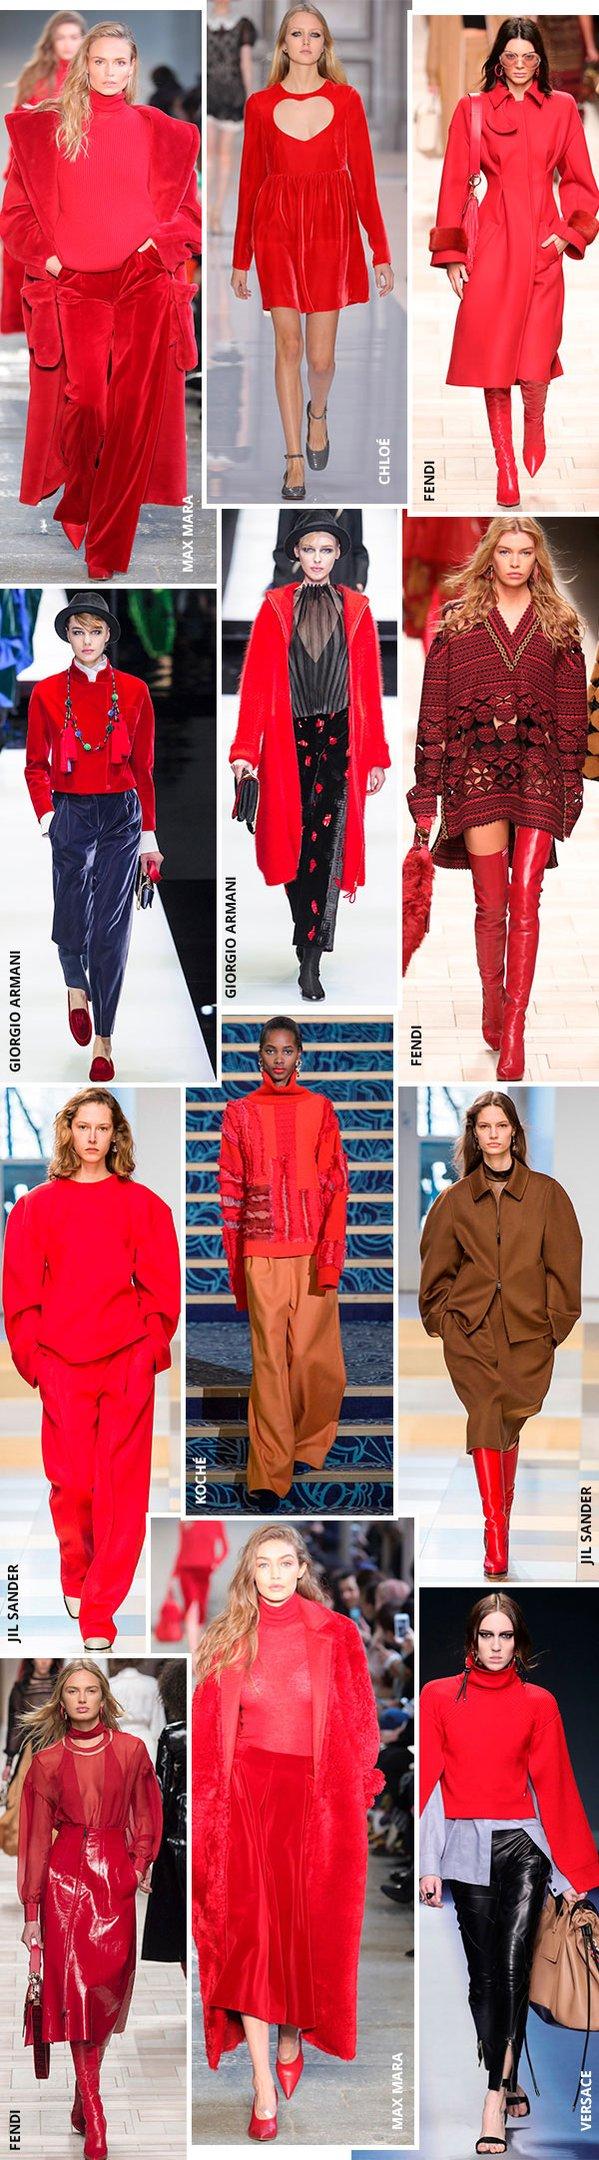 desfiles roupas vermelhaas